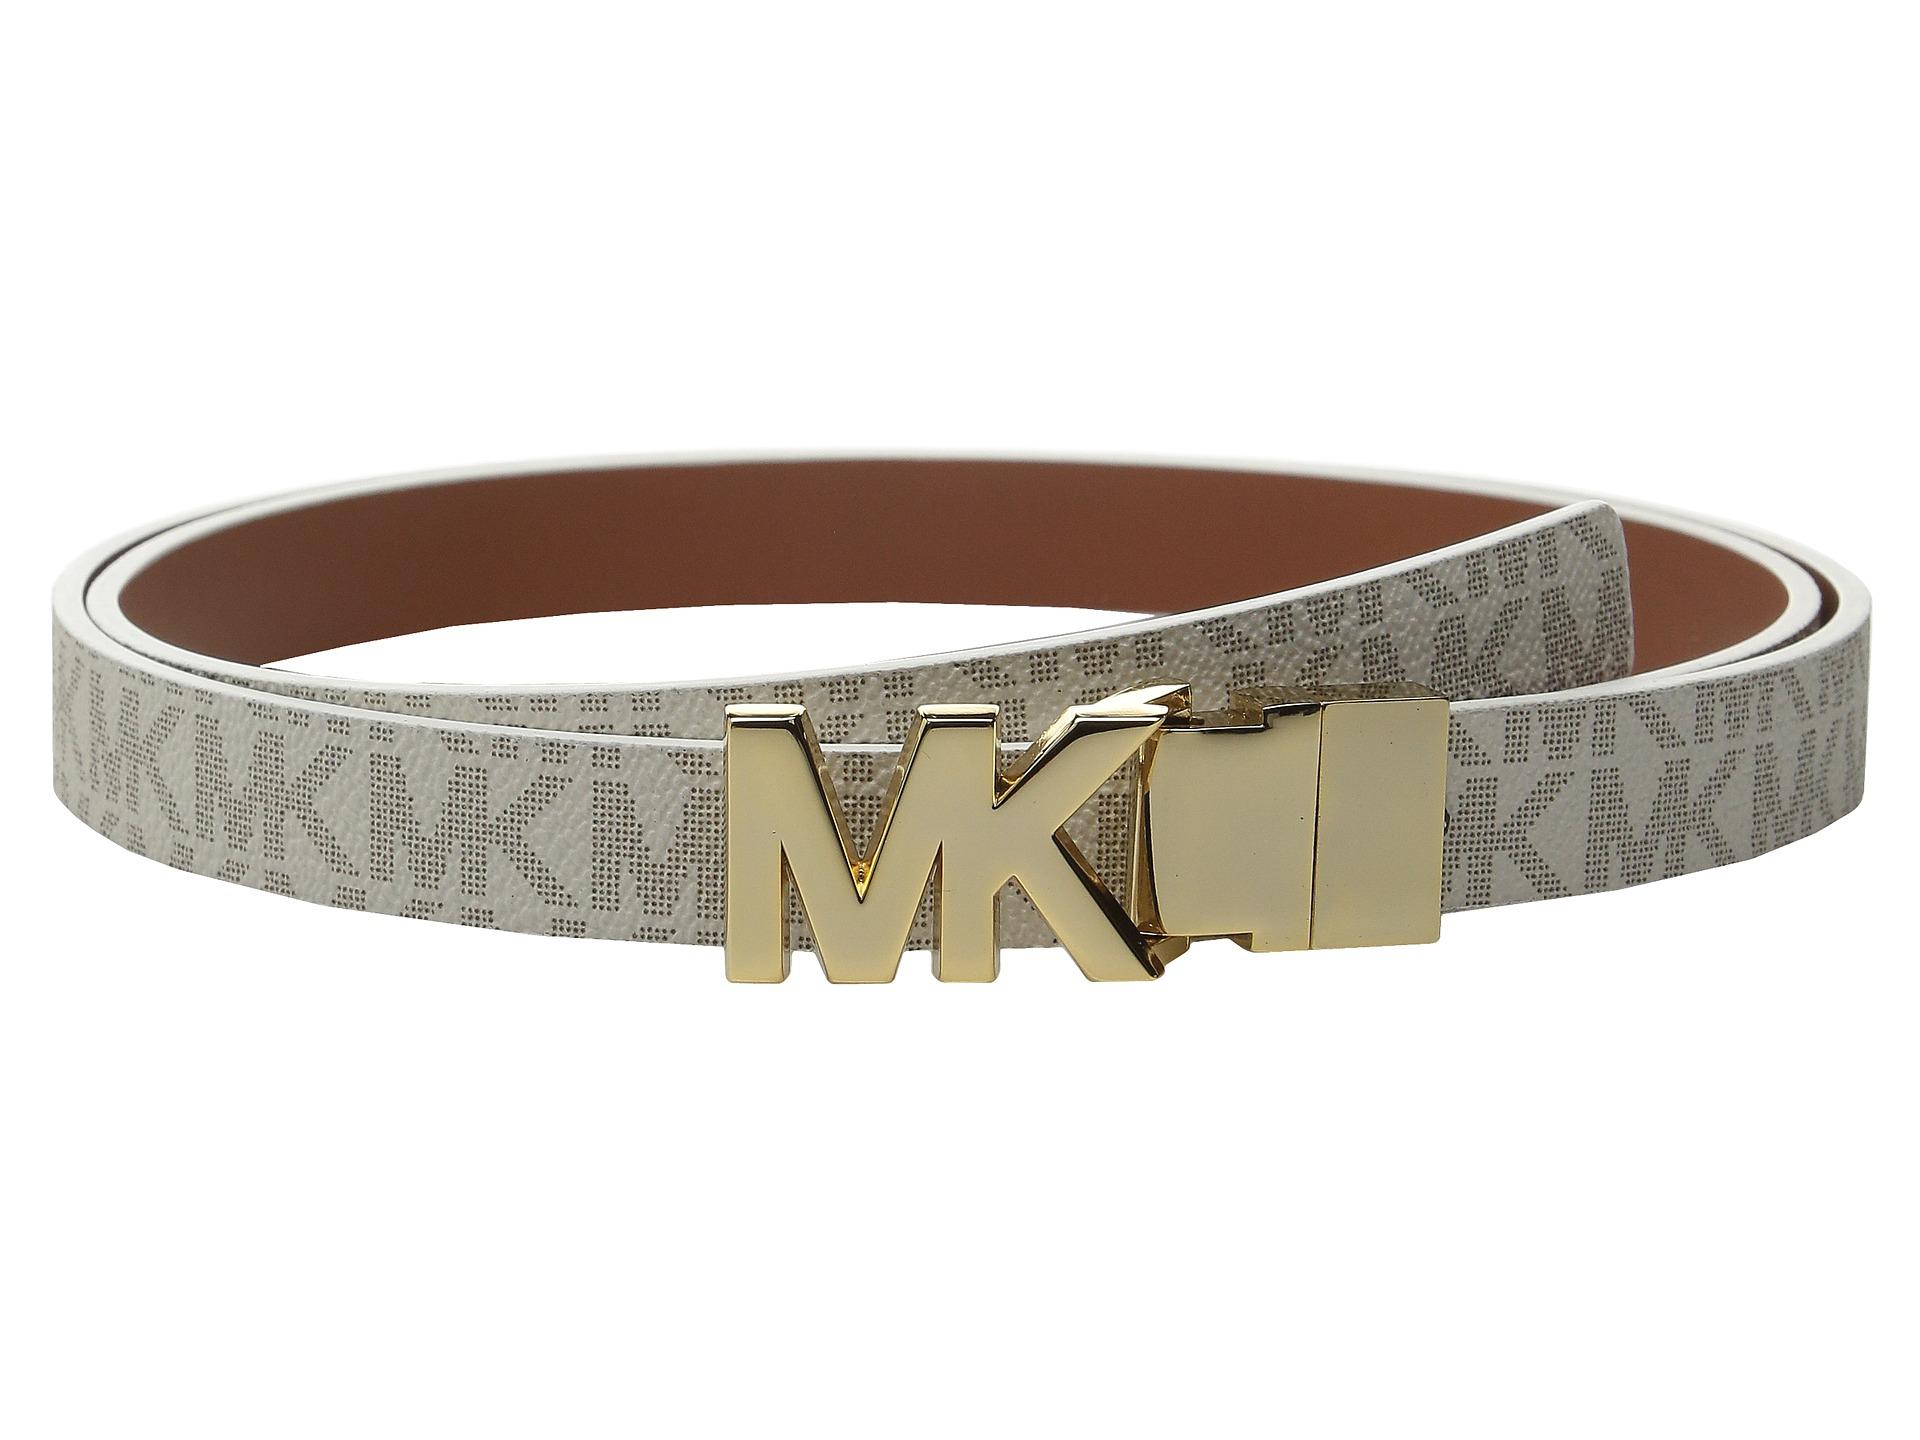 e2e011fcb632 ... shop lyst michael kors 20mm reversible logo pvc to smooth belt 02d46  33b2e